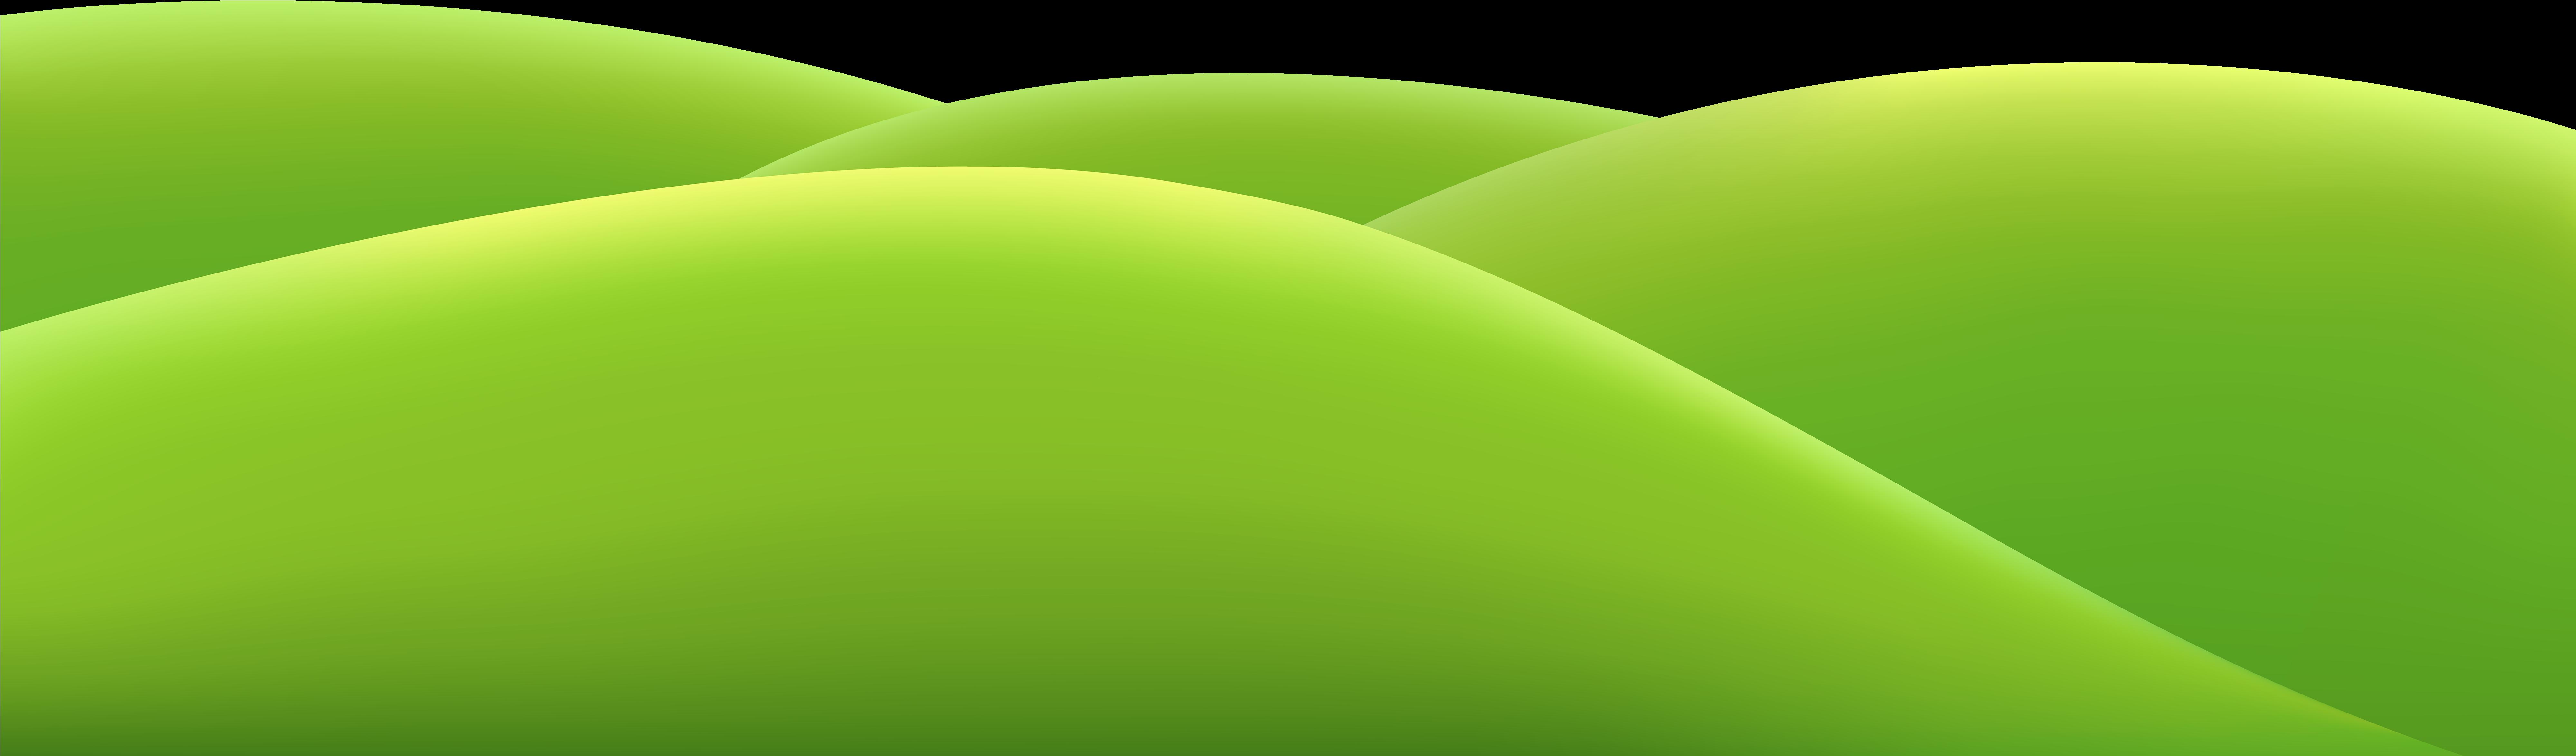 Lawn Clipart Tall Grass